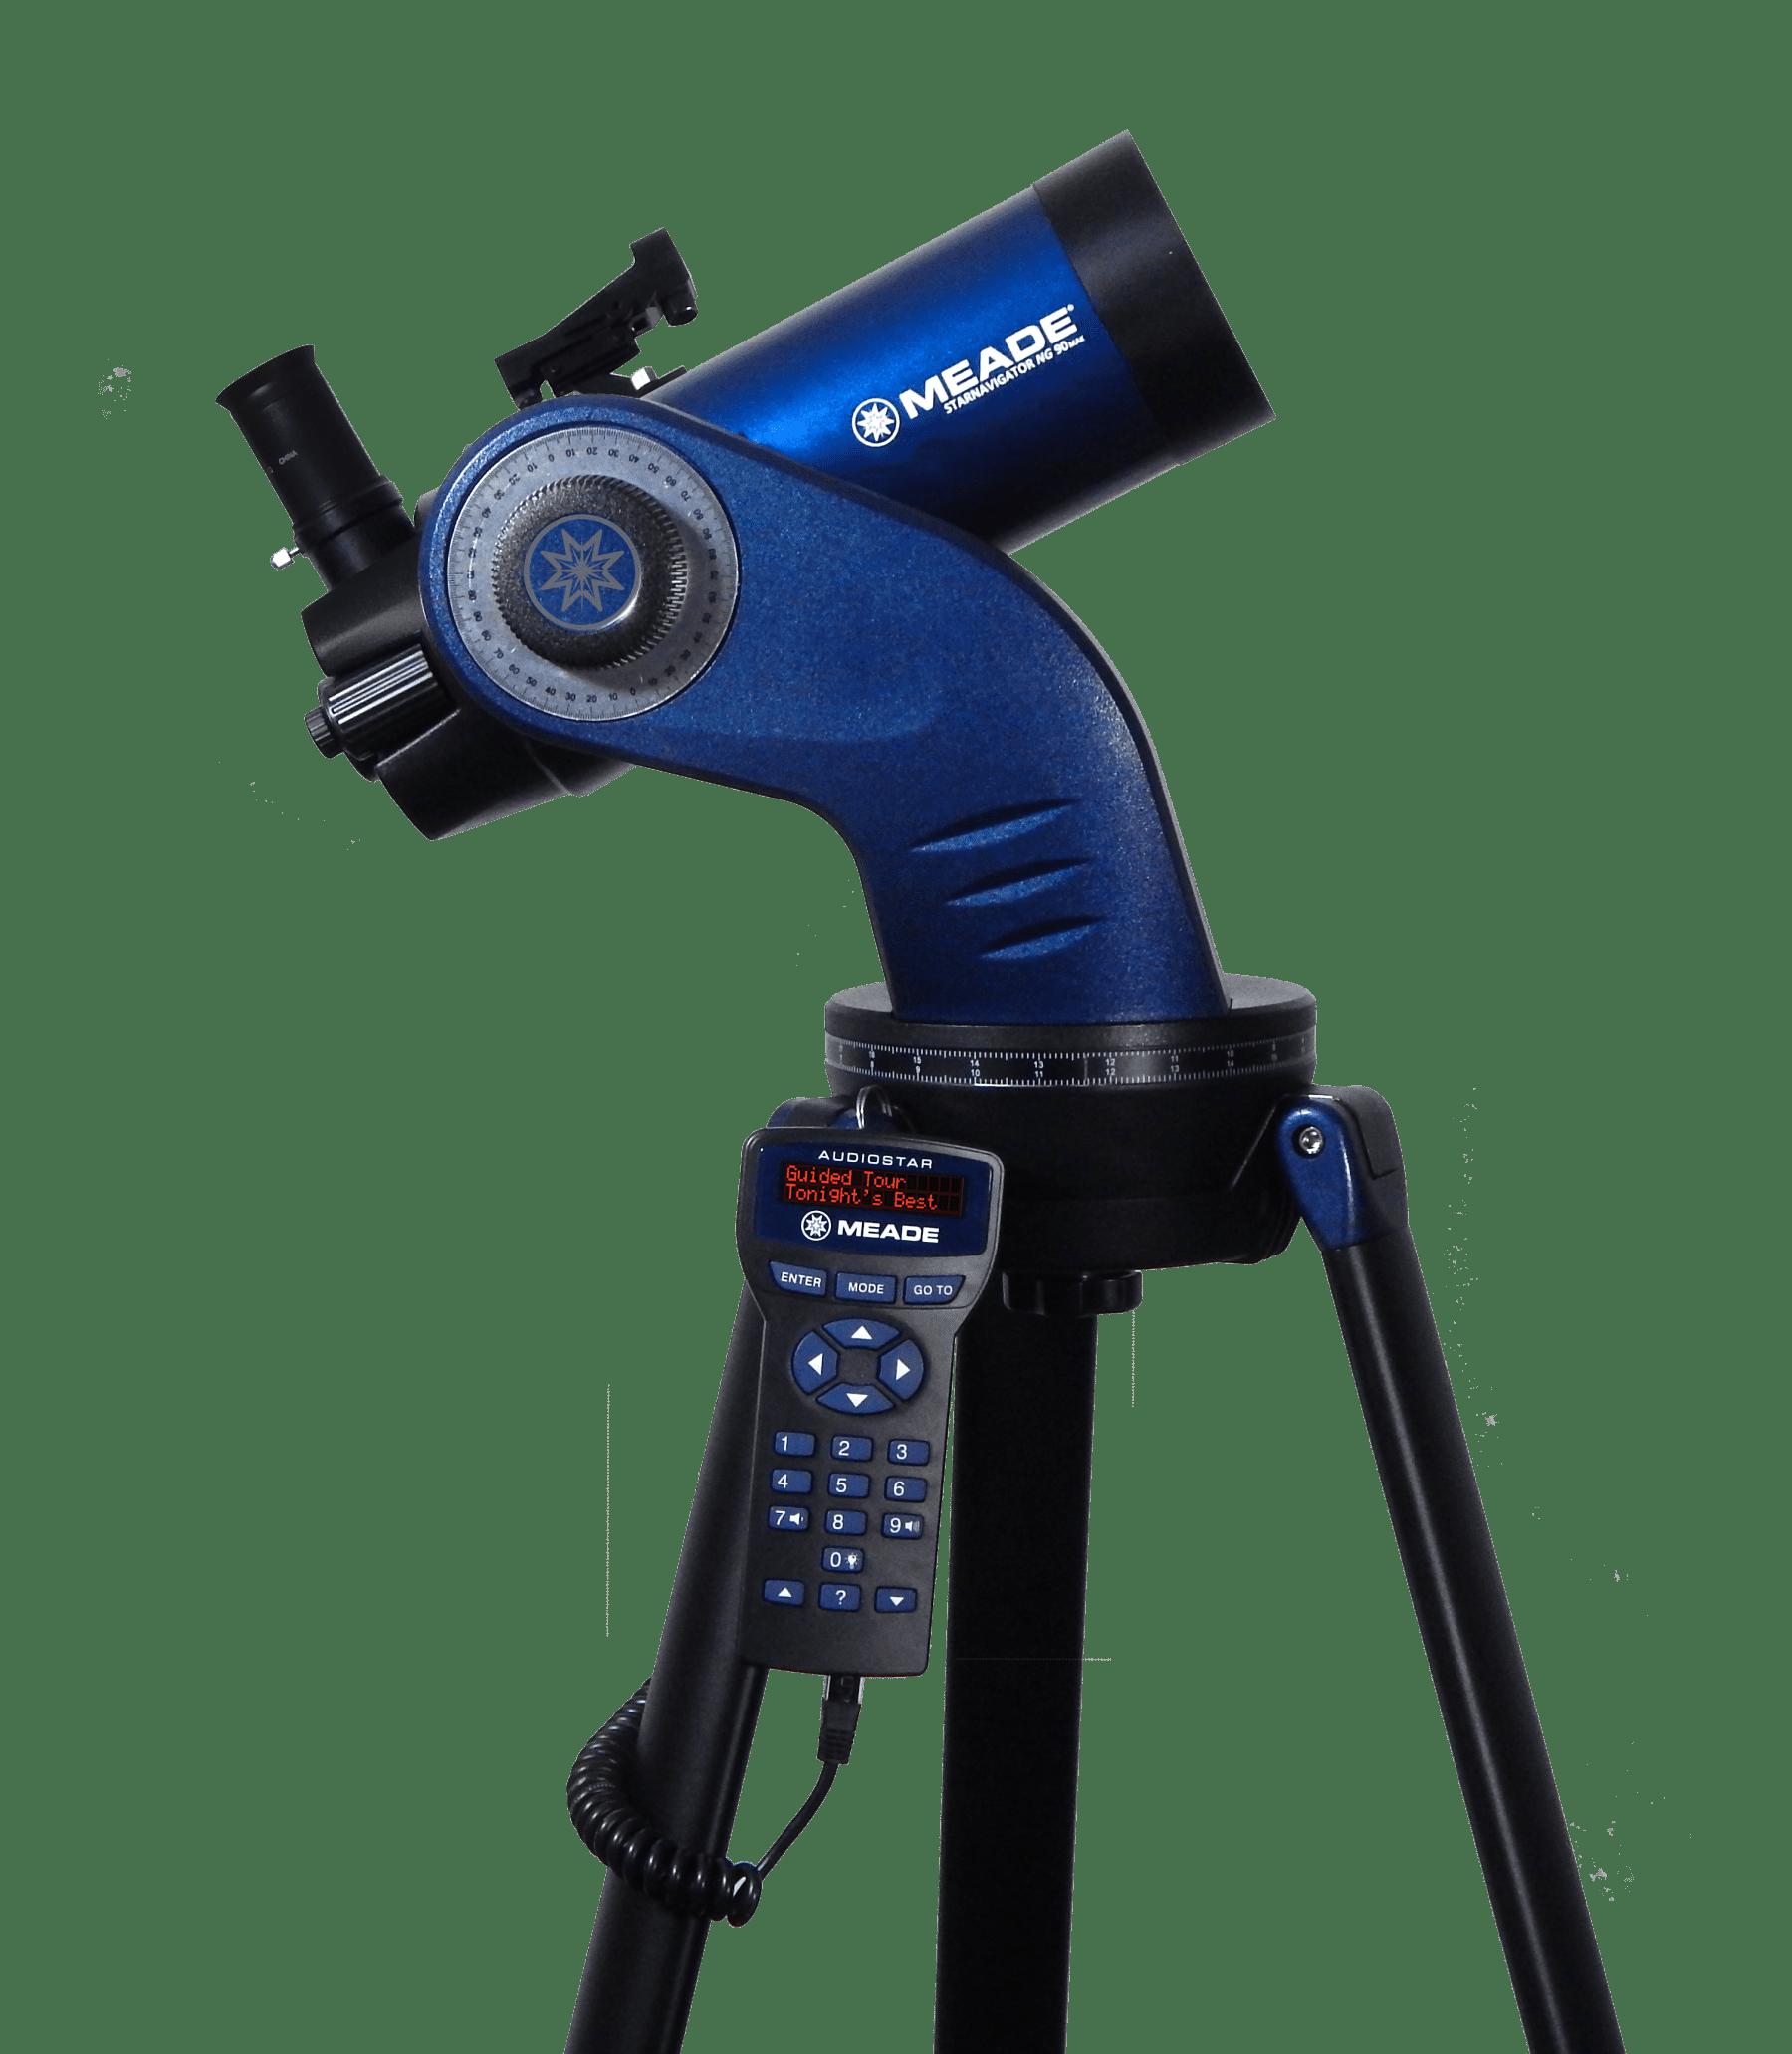 Meade Instruments StarNavigator NG 90mm Maksutov-Cassegrain Telescope by Meade Instruments